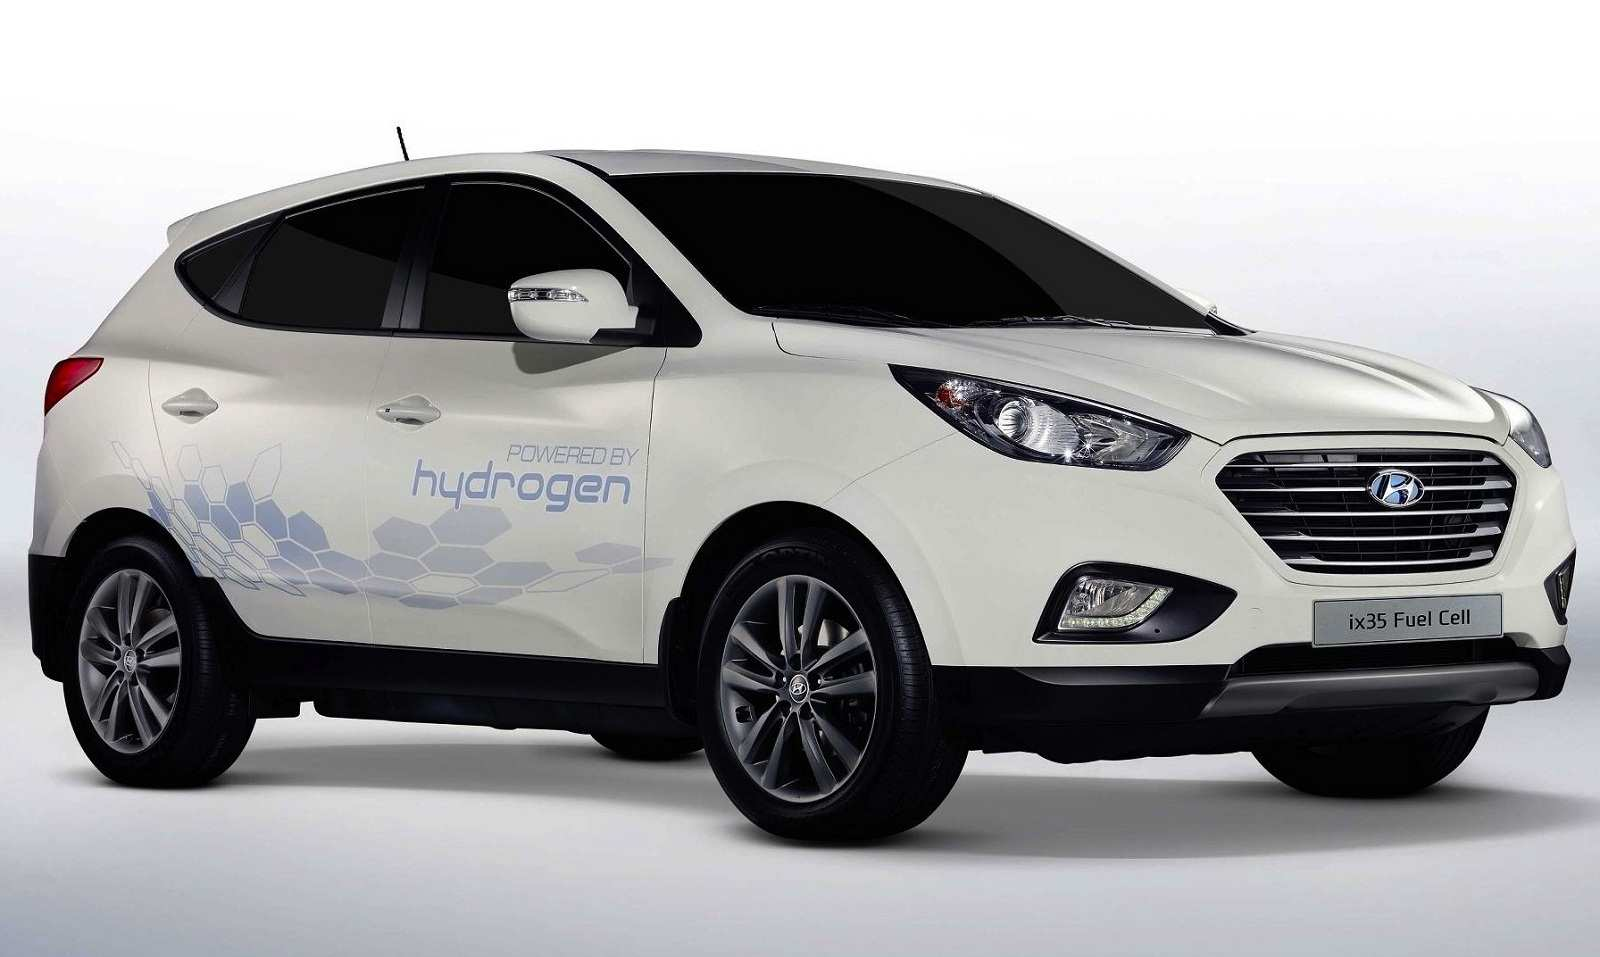 72 Great 2020 Hyundai Ix35 2018 New Review with 2020 Hyundai Ix35 2018